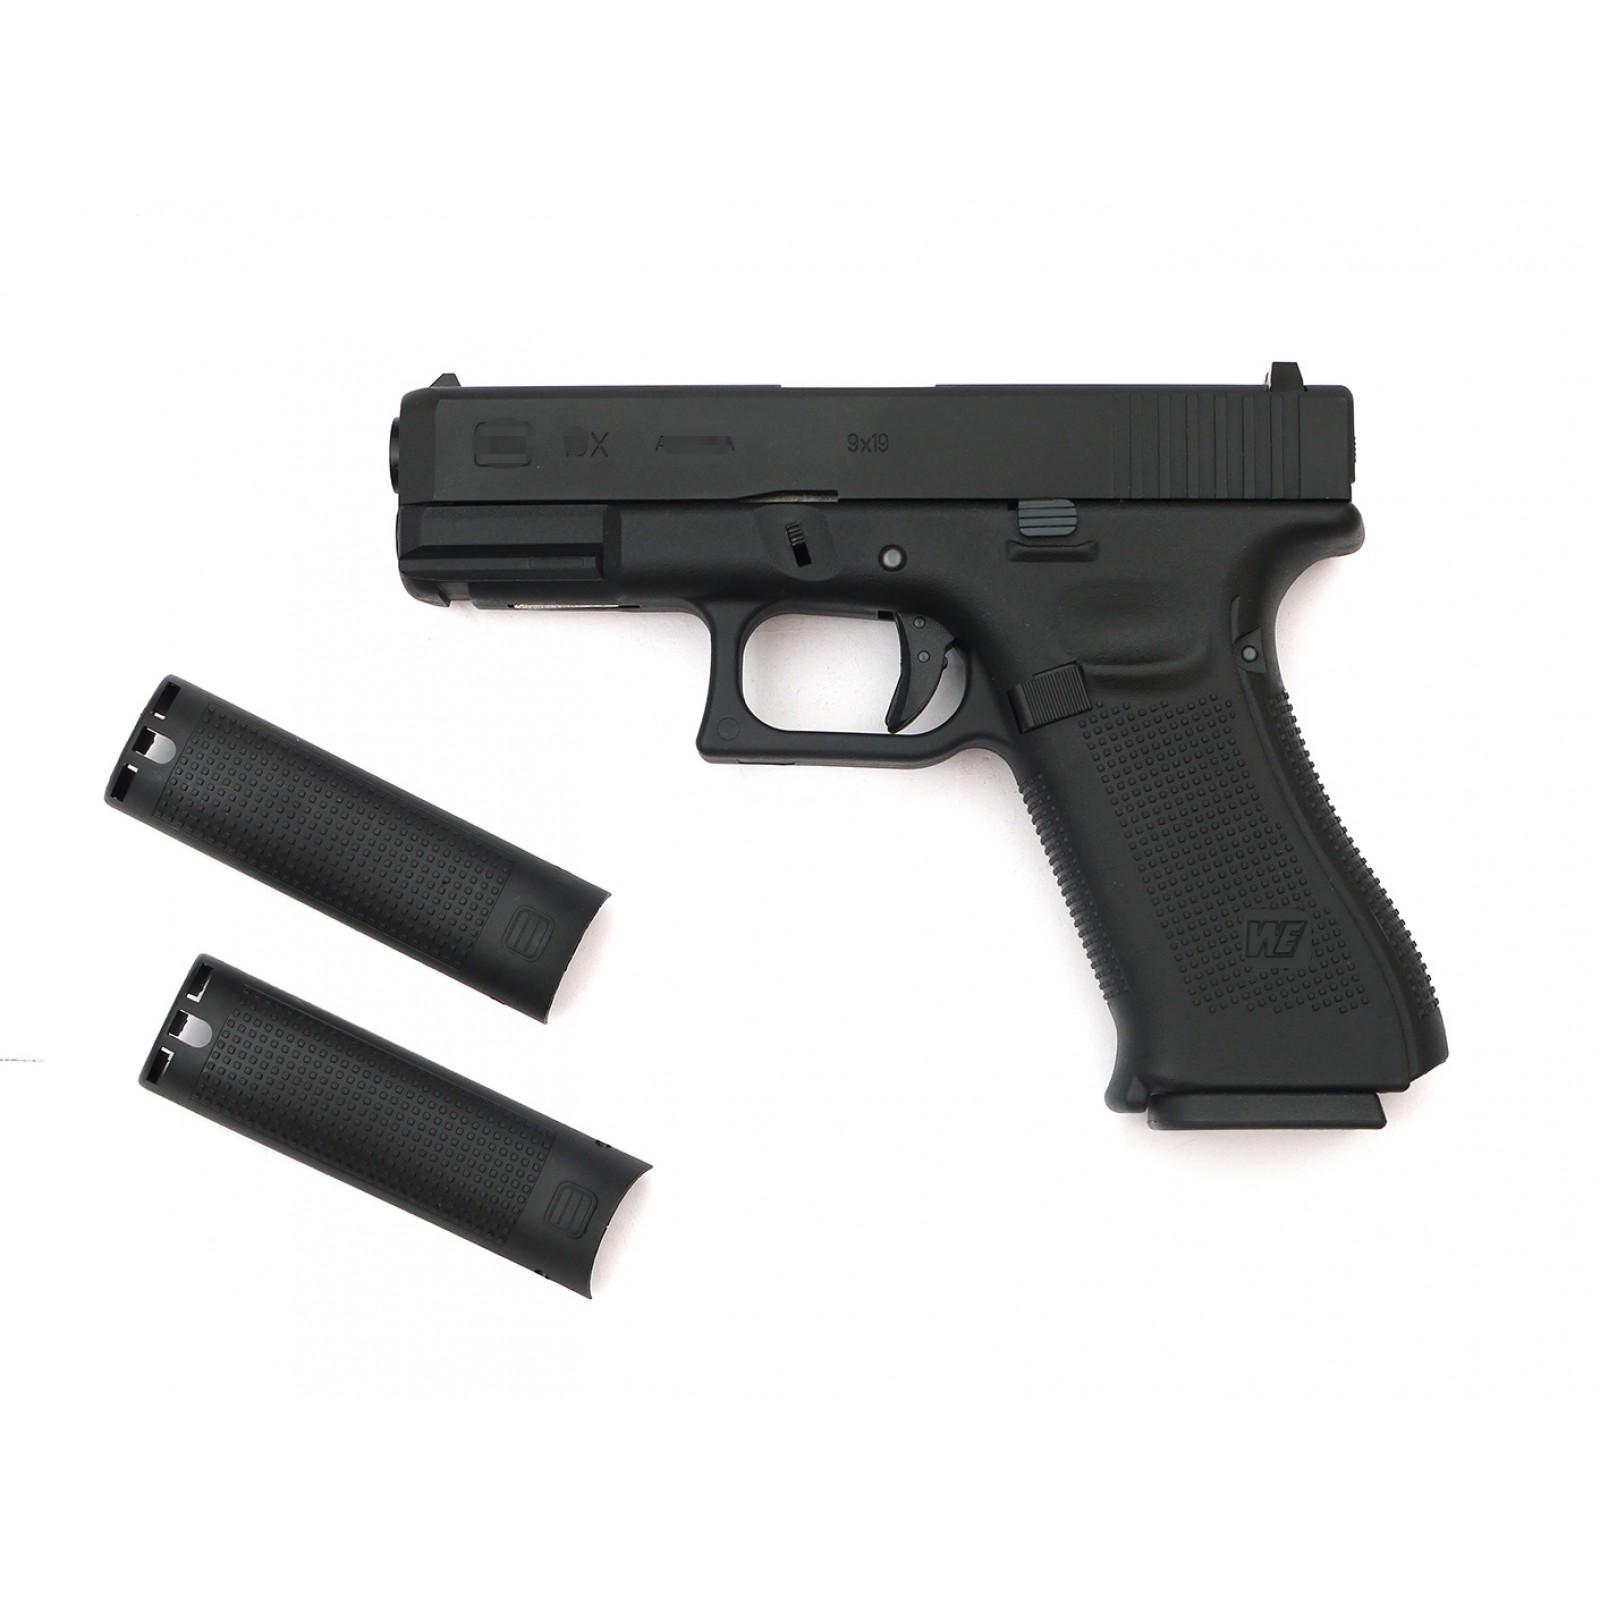 WE G19XL GBB pistol BK (Custom CNC marking) - CUSTOM WORK